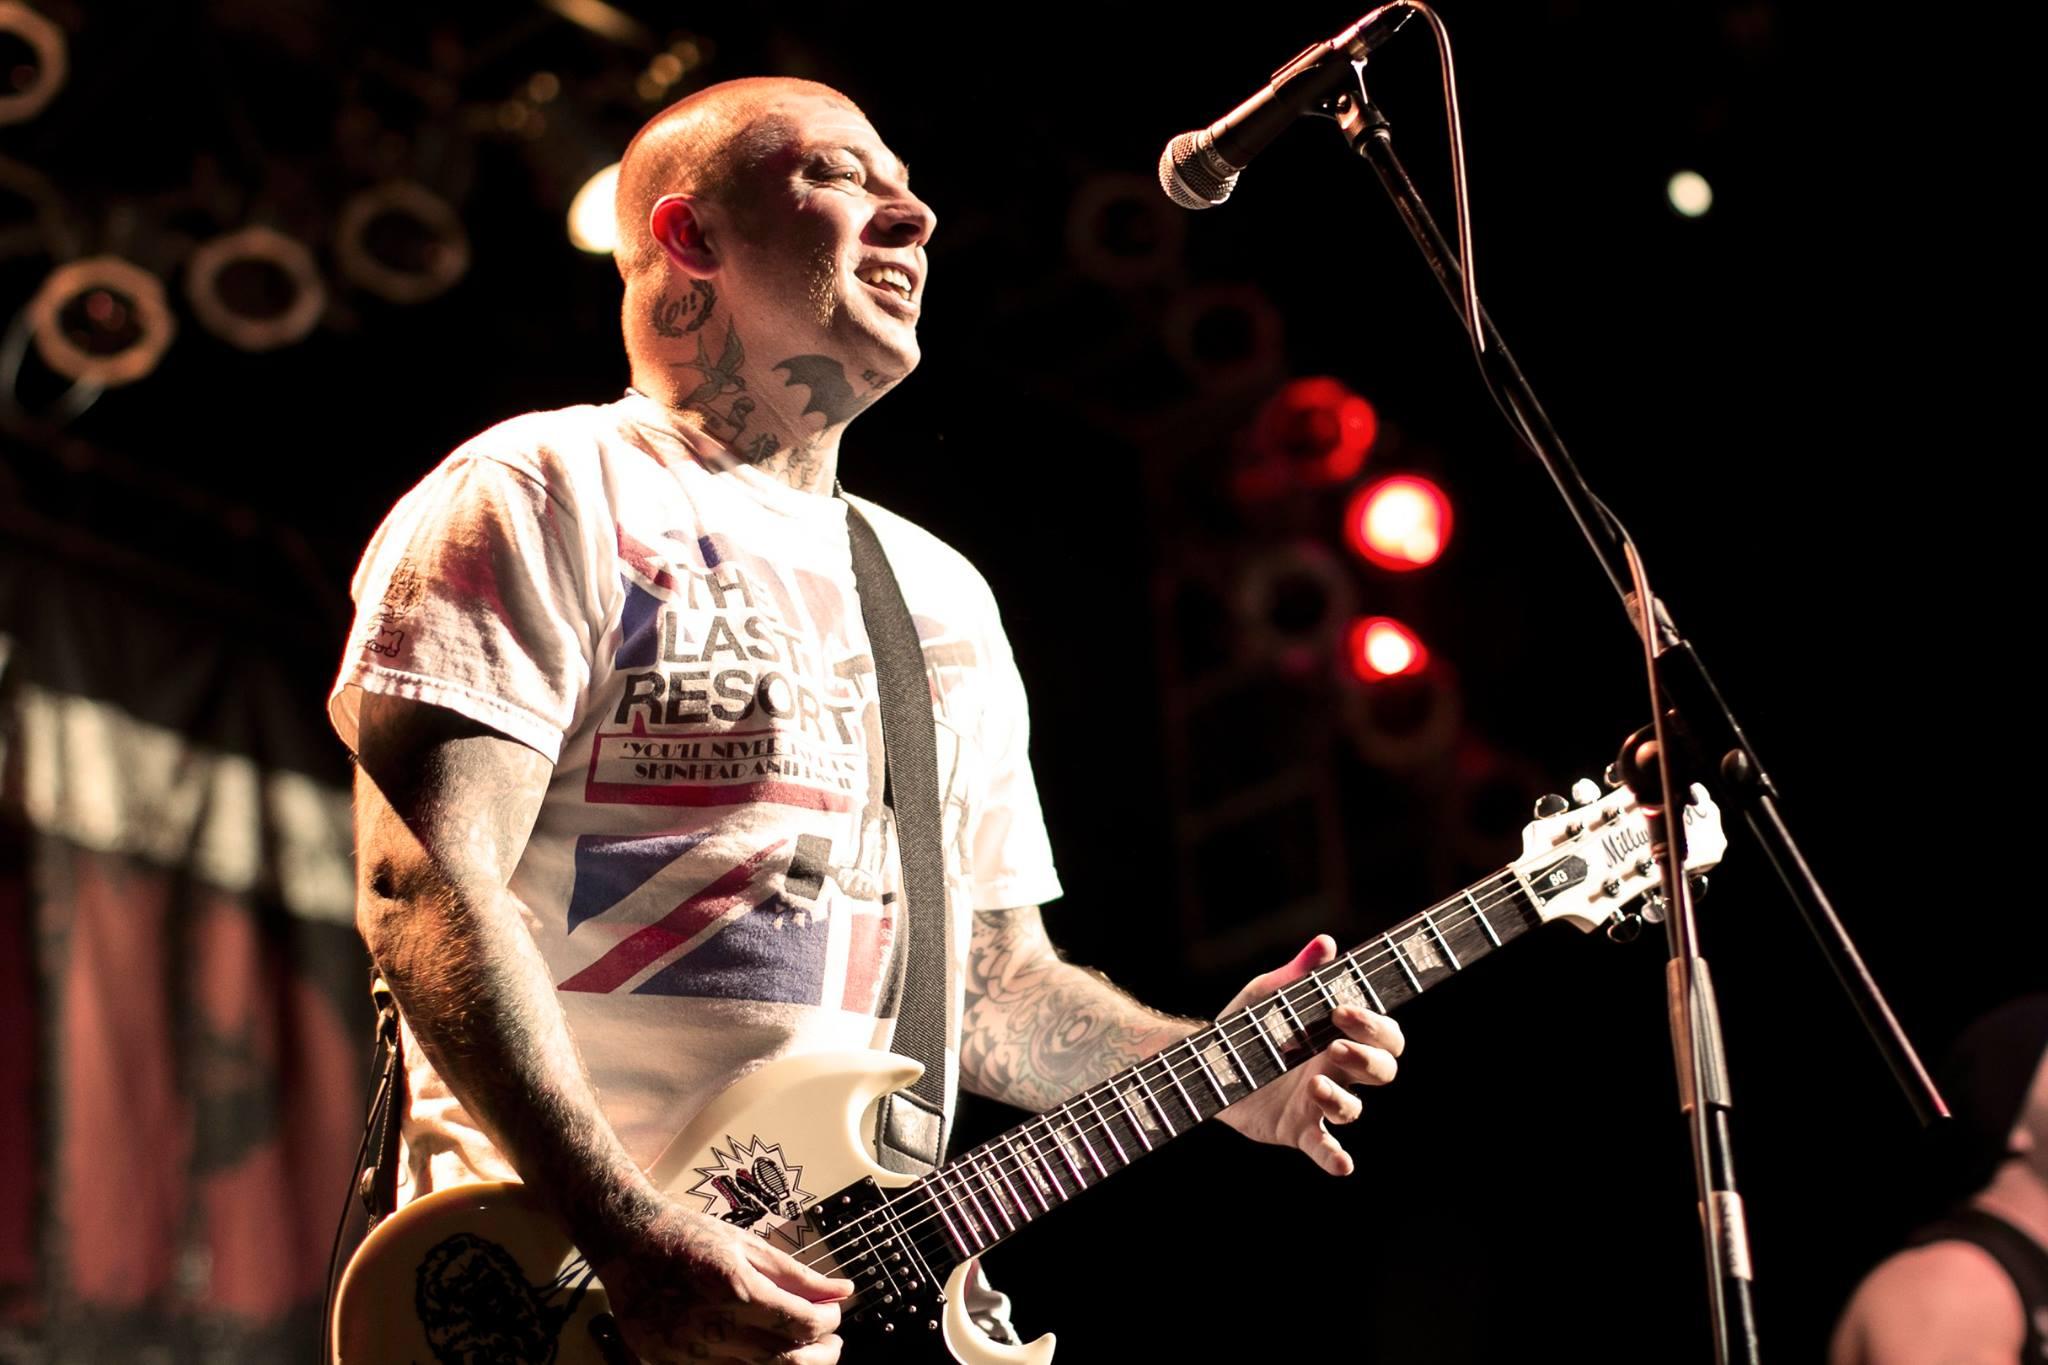 Rancid lead guitarist Lars Frederiksen performing at House of Blues Las Vegas on July 2013. Photo by Tyler Newton.